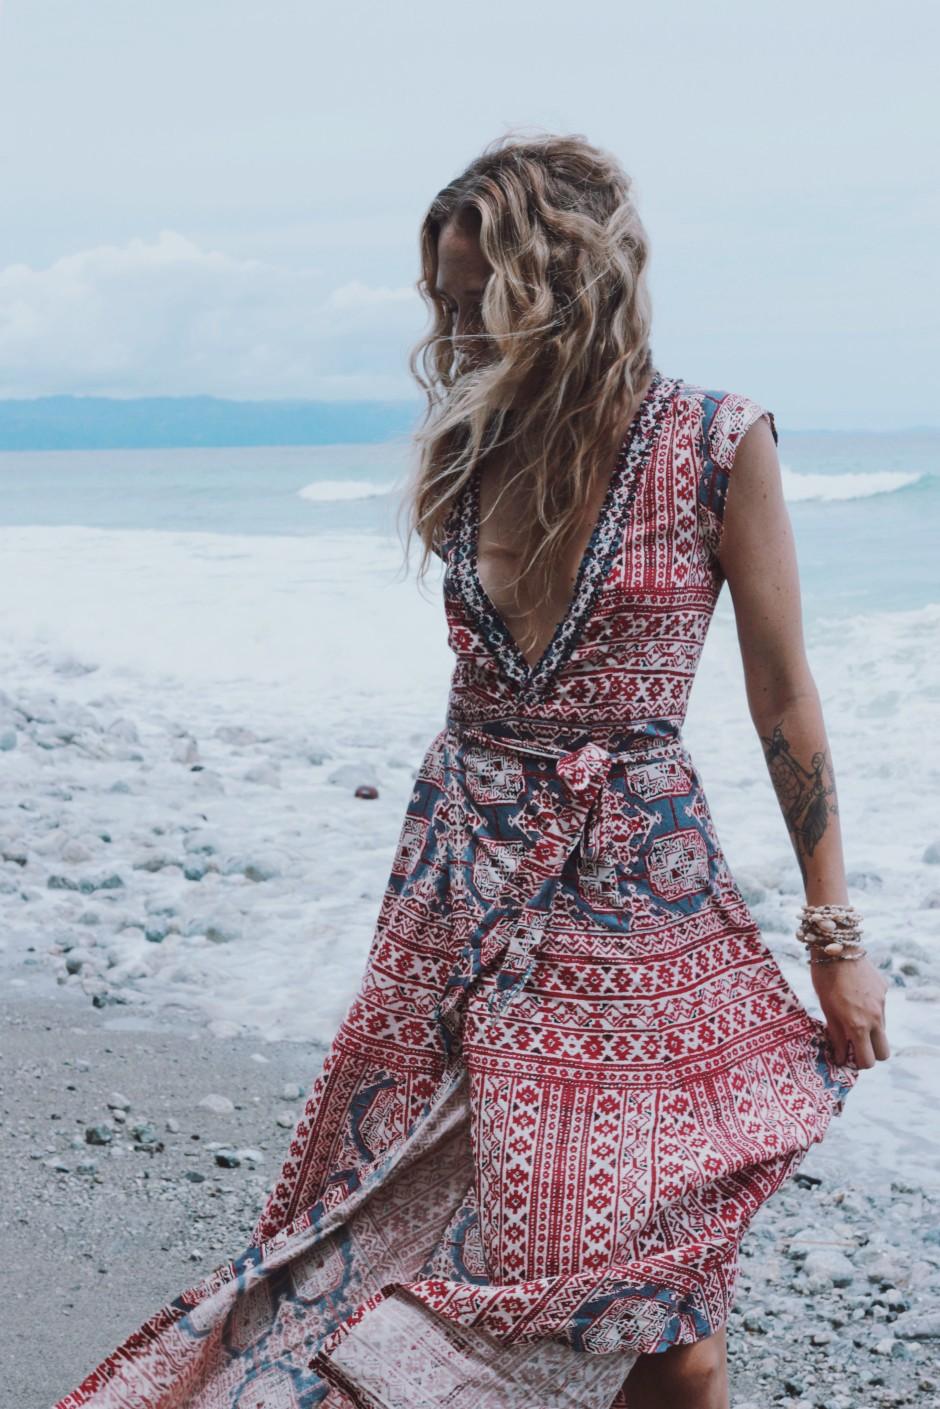 Gypsy05 x Wild & Free Blog